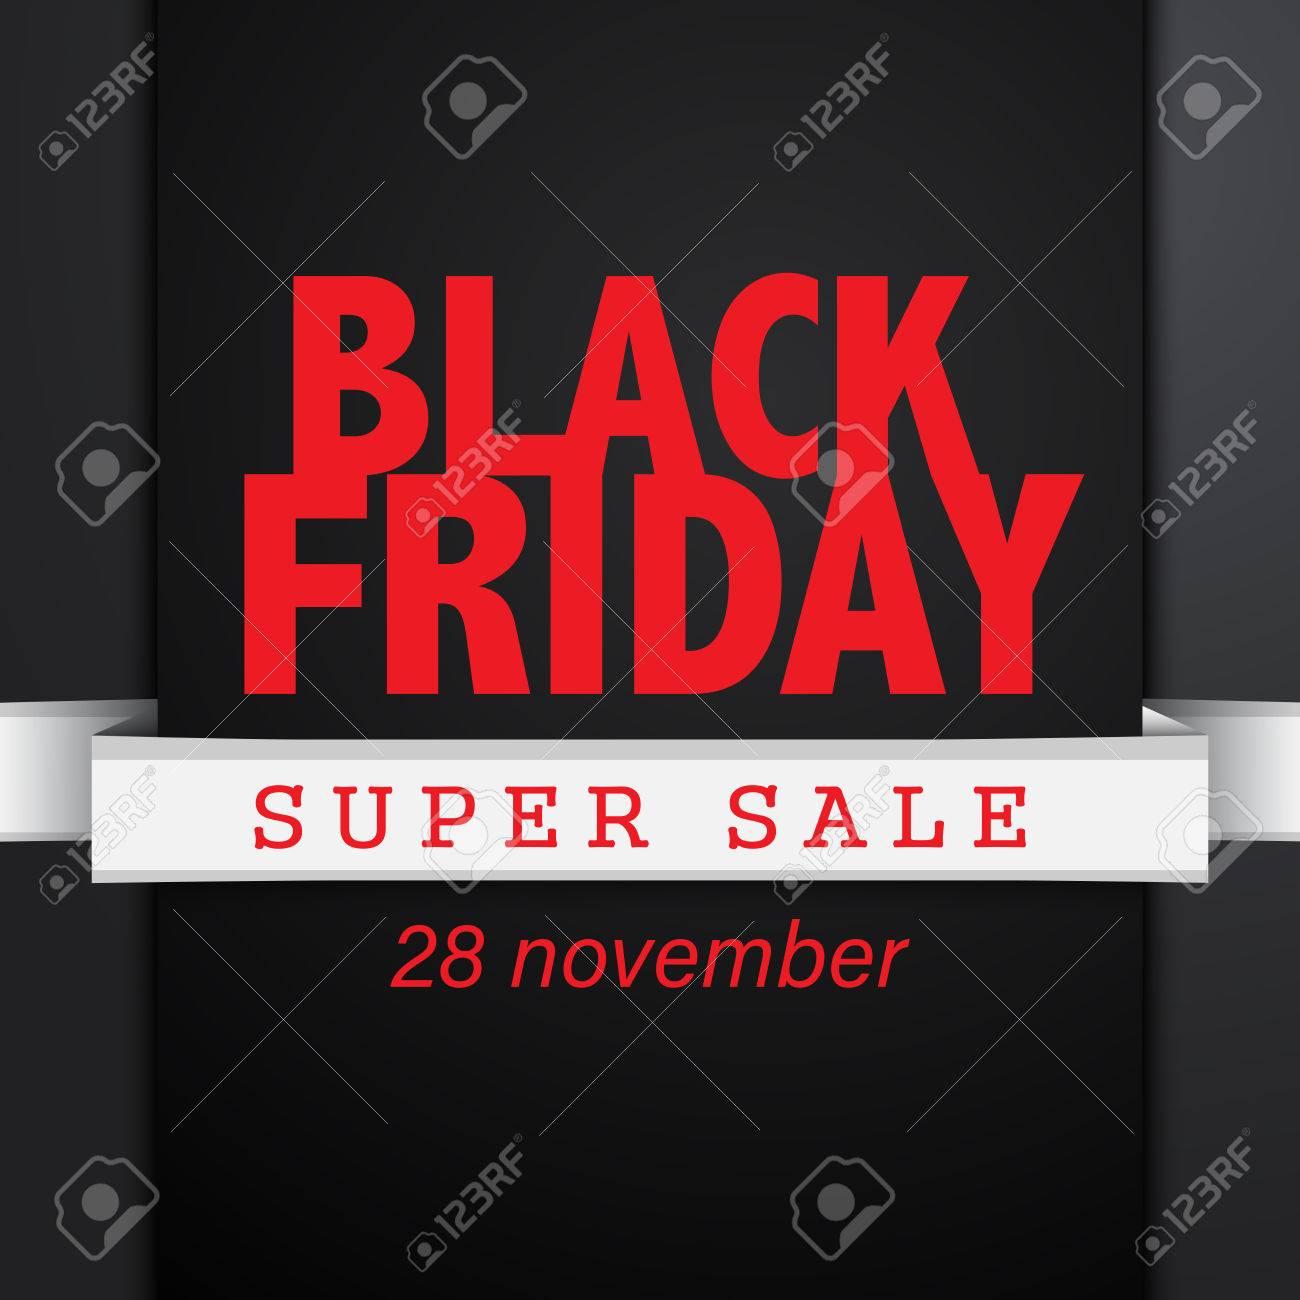 Black friday sale banner EPS10 Vector - 51756193